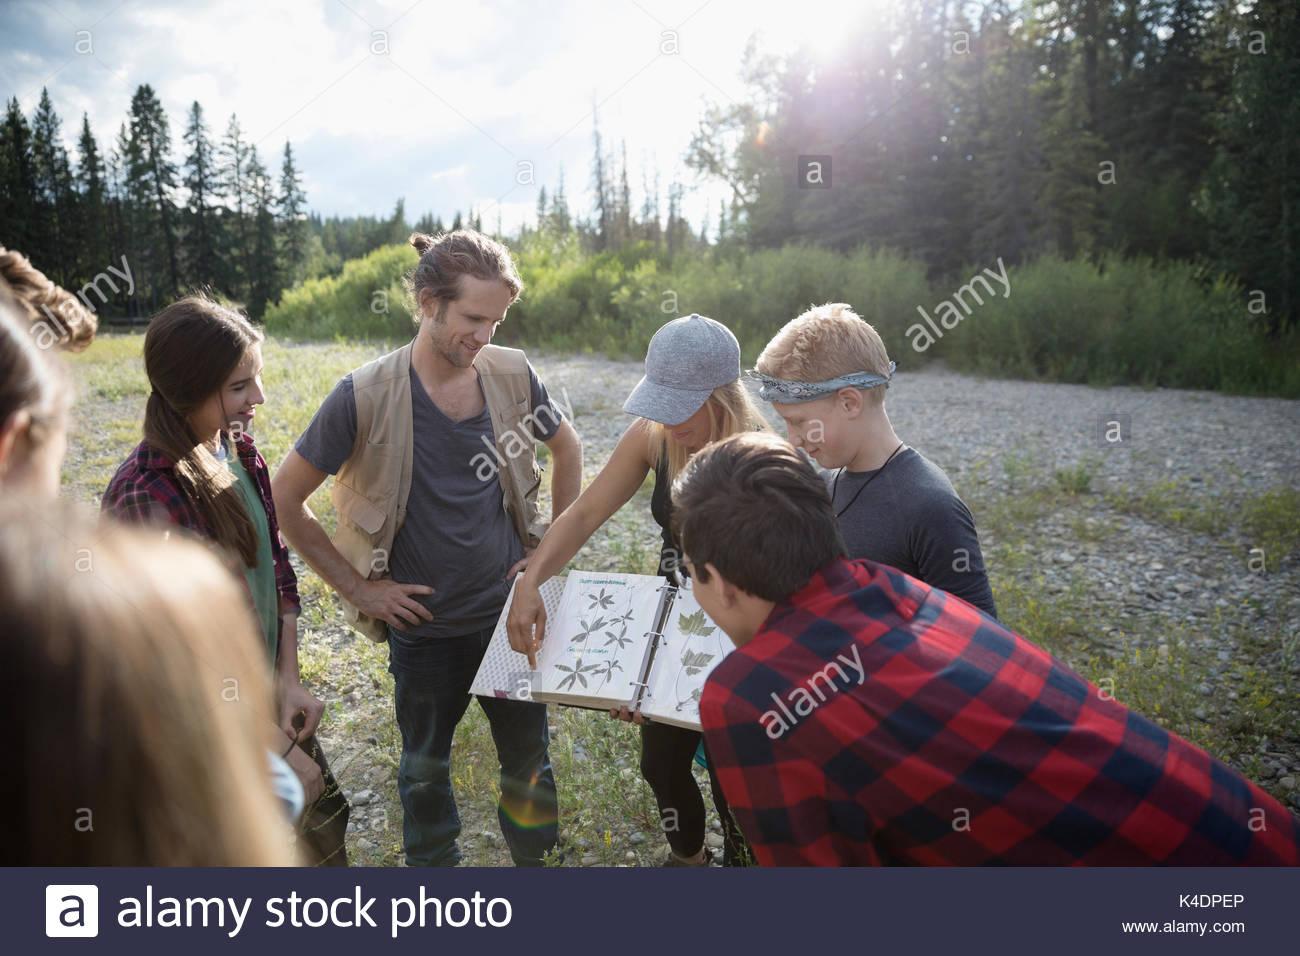 Lehrer zeigen Pflanze Fotos zu Teenager outdoor Schüler im sonnigen Bereich Stockbild